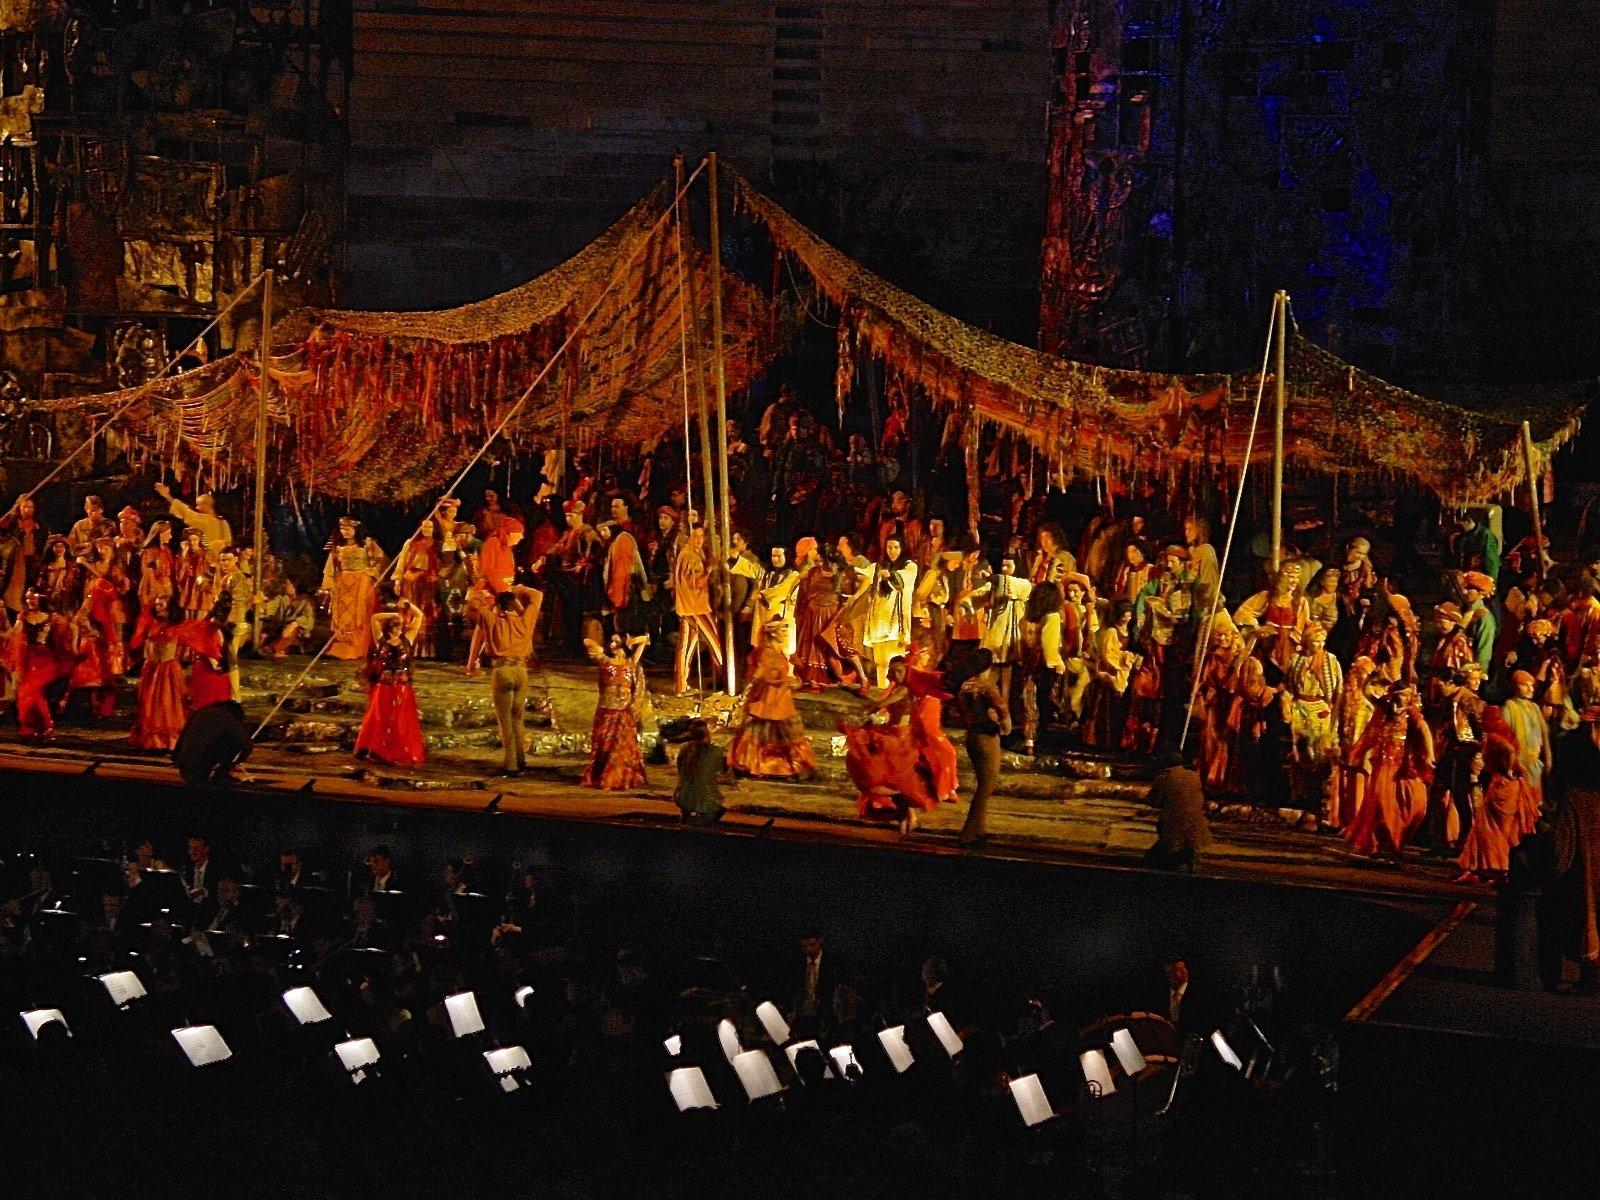 L' Arena Opera - Rigoletto, Verona 2018 by Robert Malin Young